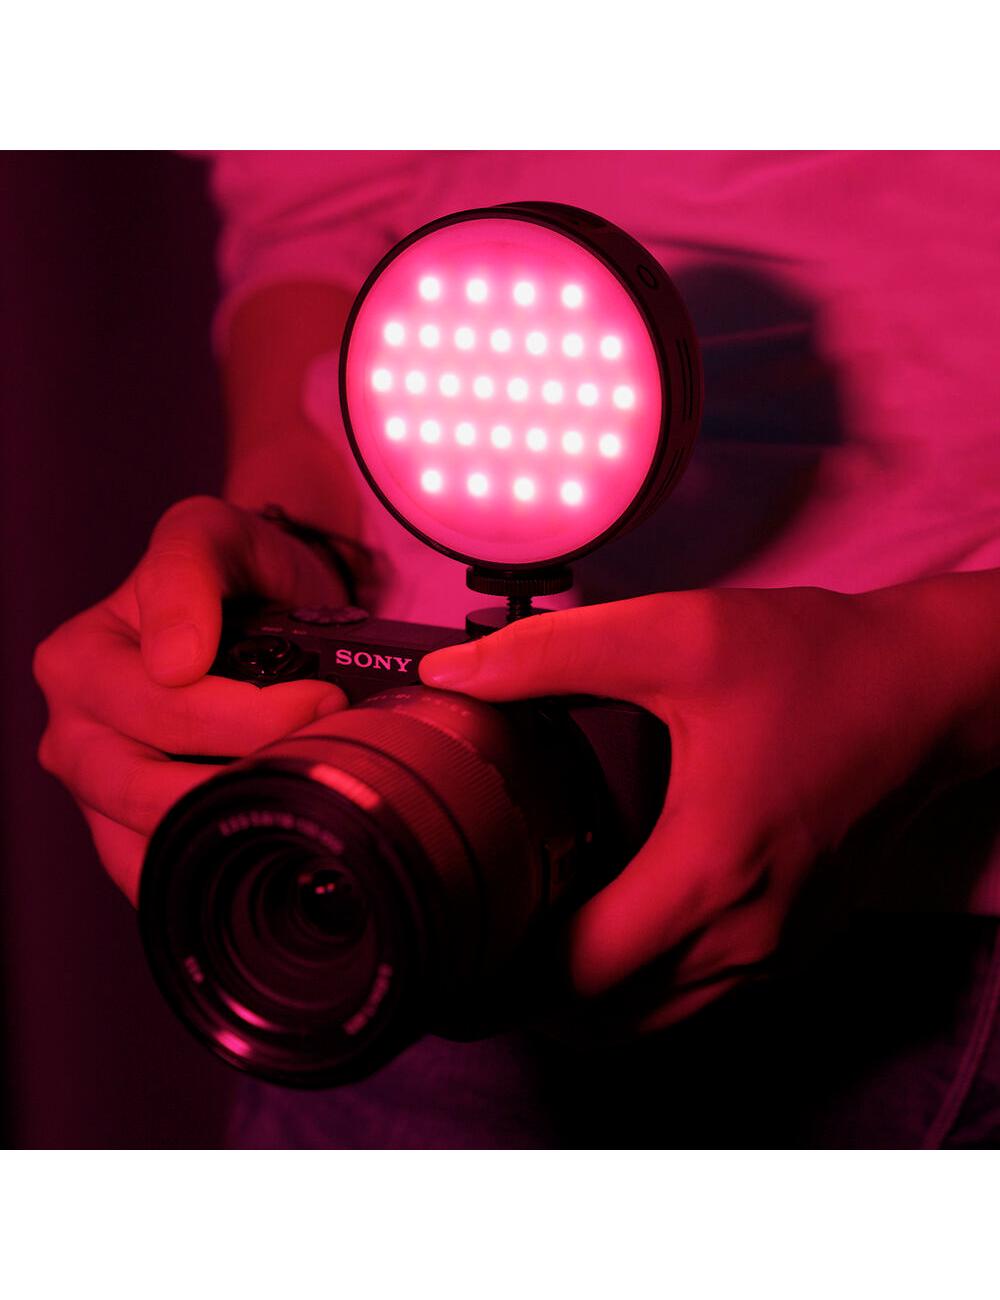 KIT - Profoto B10 Flash Con Batería, Beauty Dish, Trípode Manfrotto y Bolso Canon